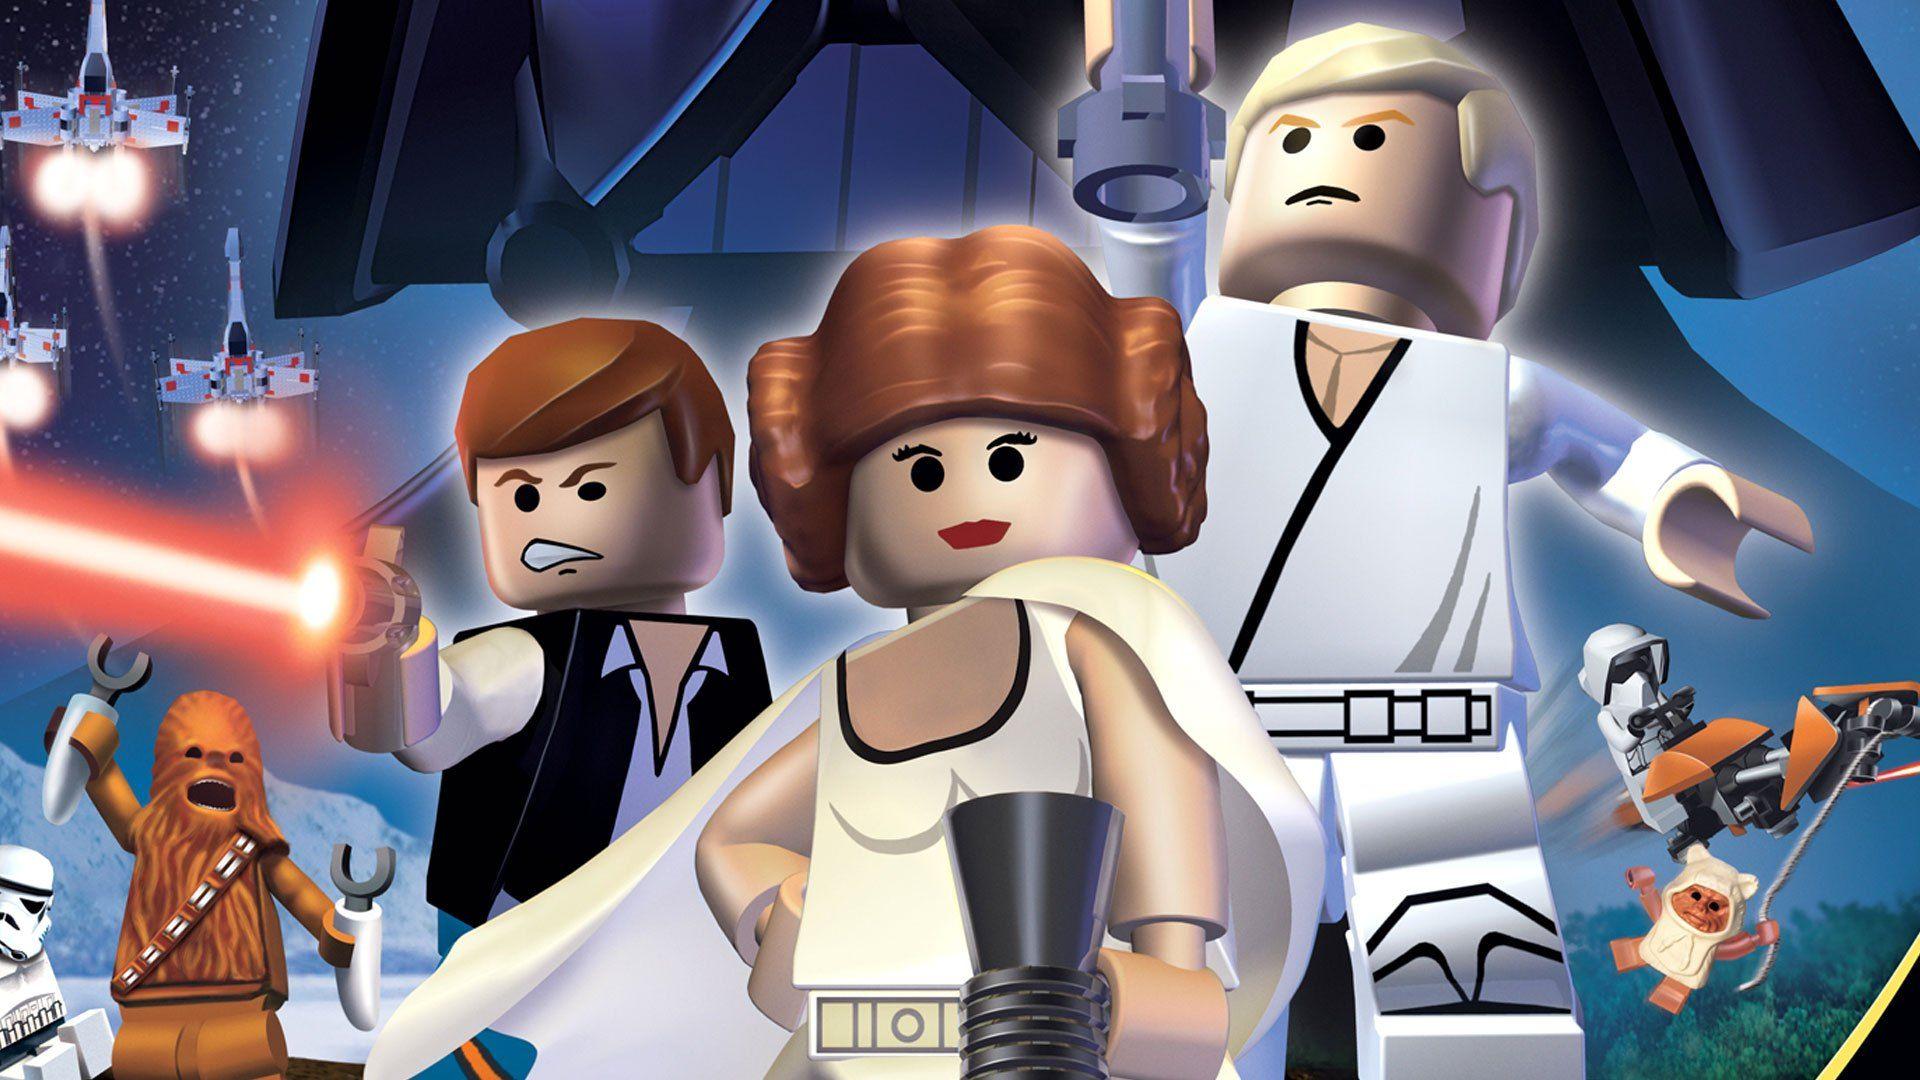 Lego Star Wars The Skywalker Saga Wallpapers Playstation Universe